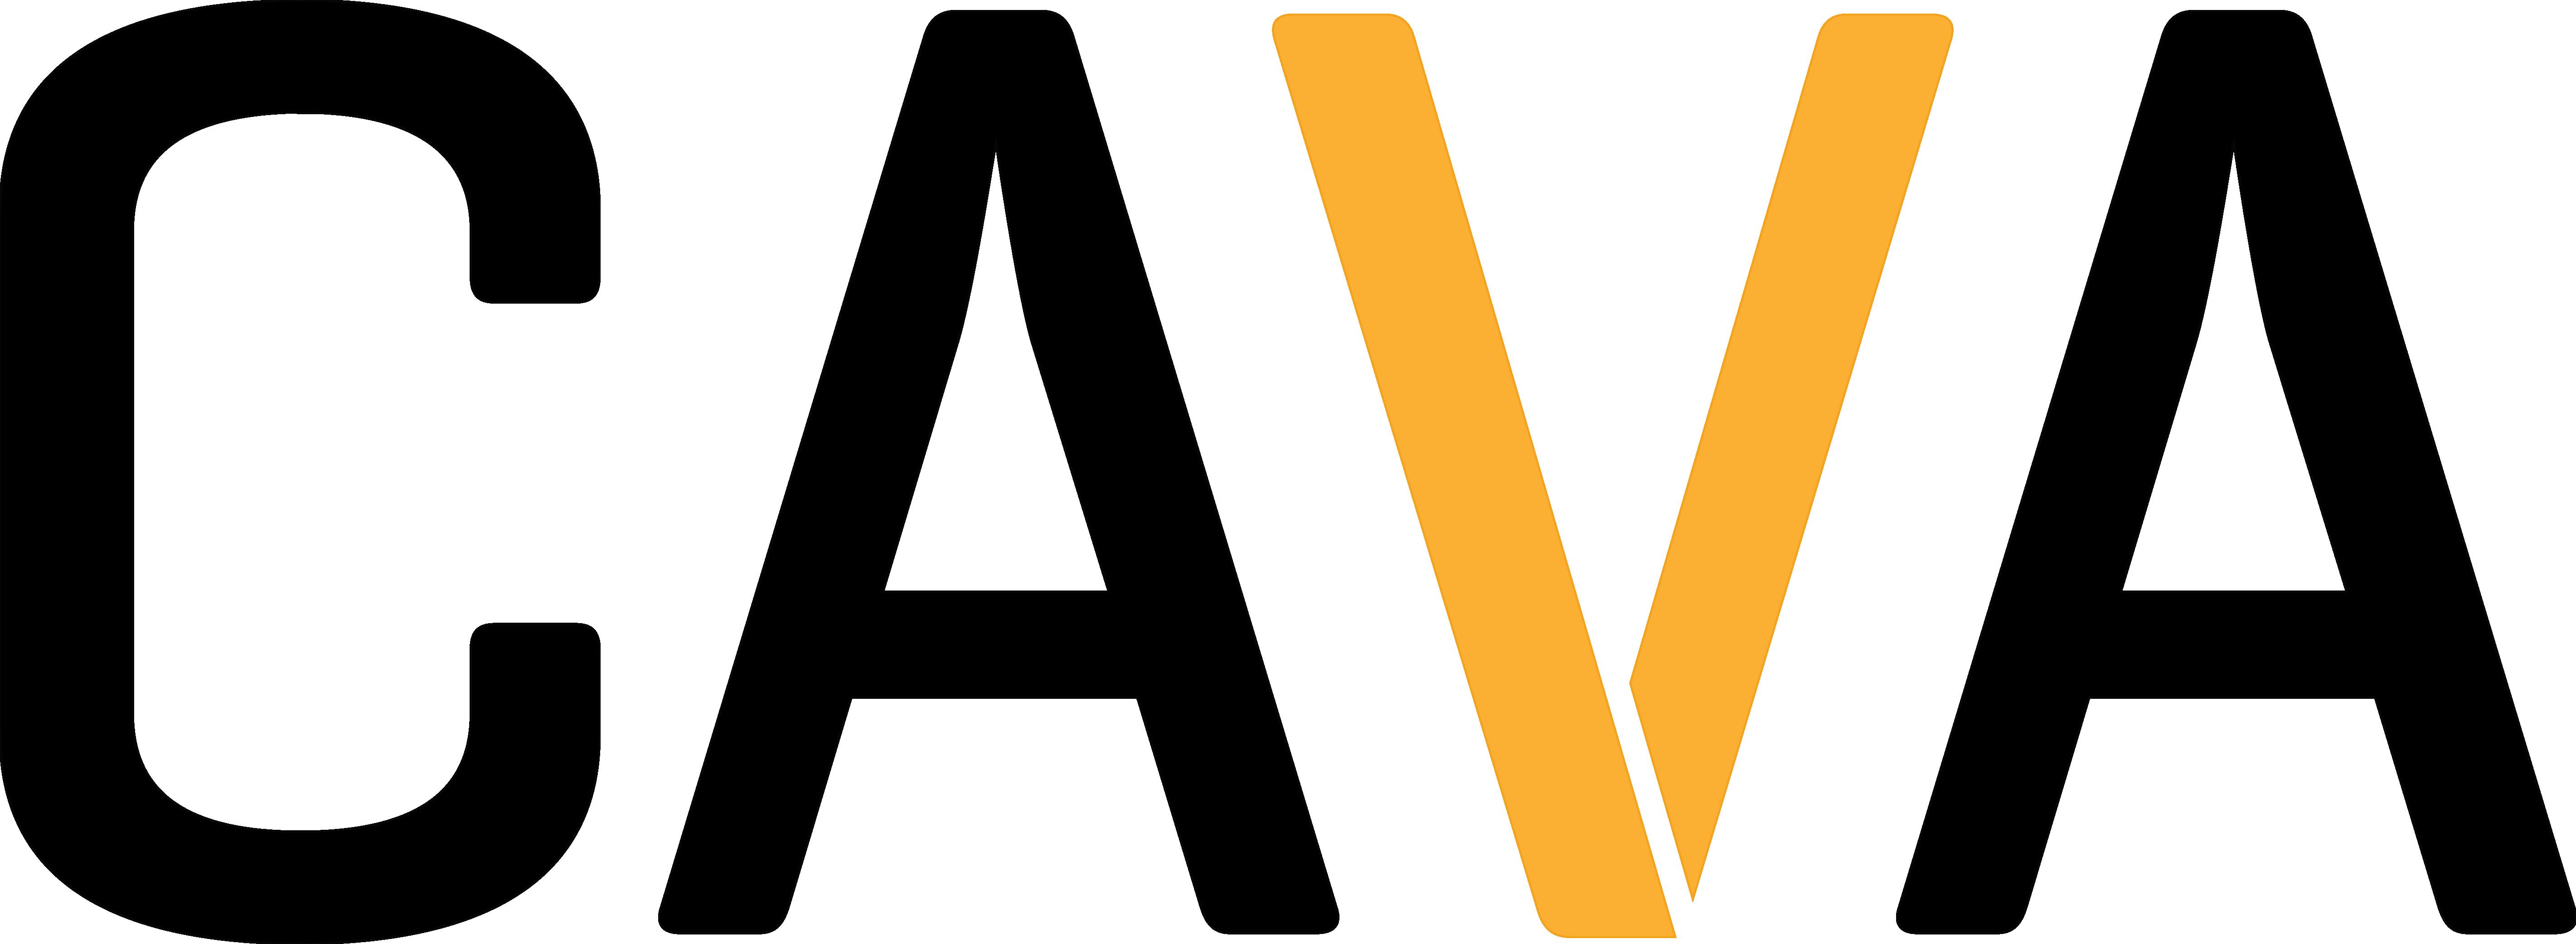 logo_cavaOnly_blackText_web_rgb-01_(1).png